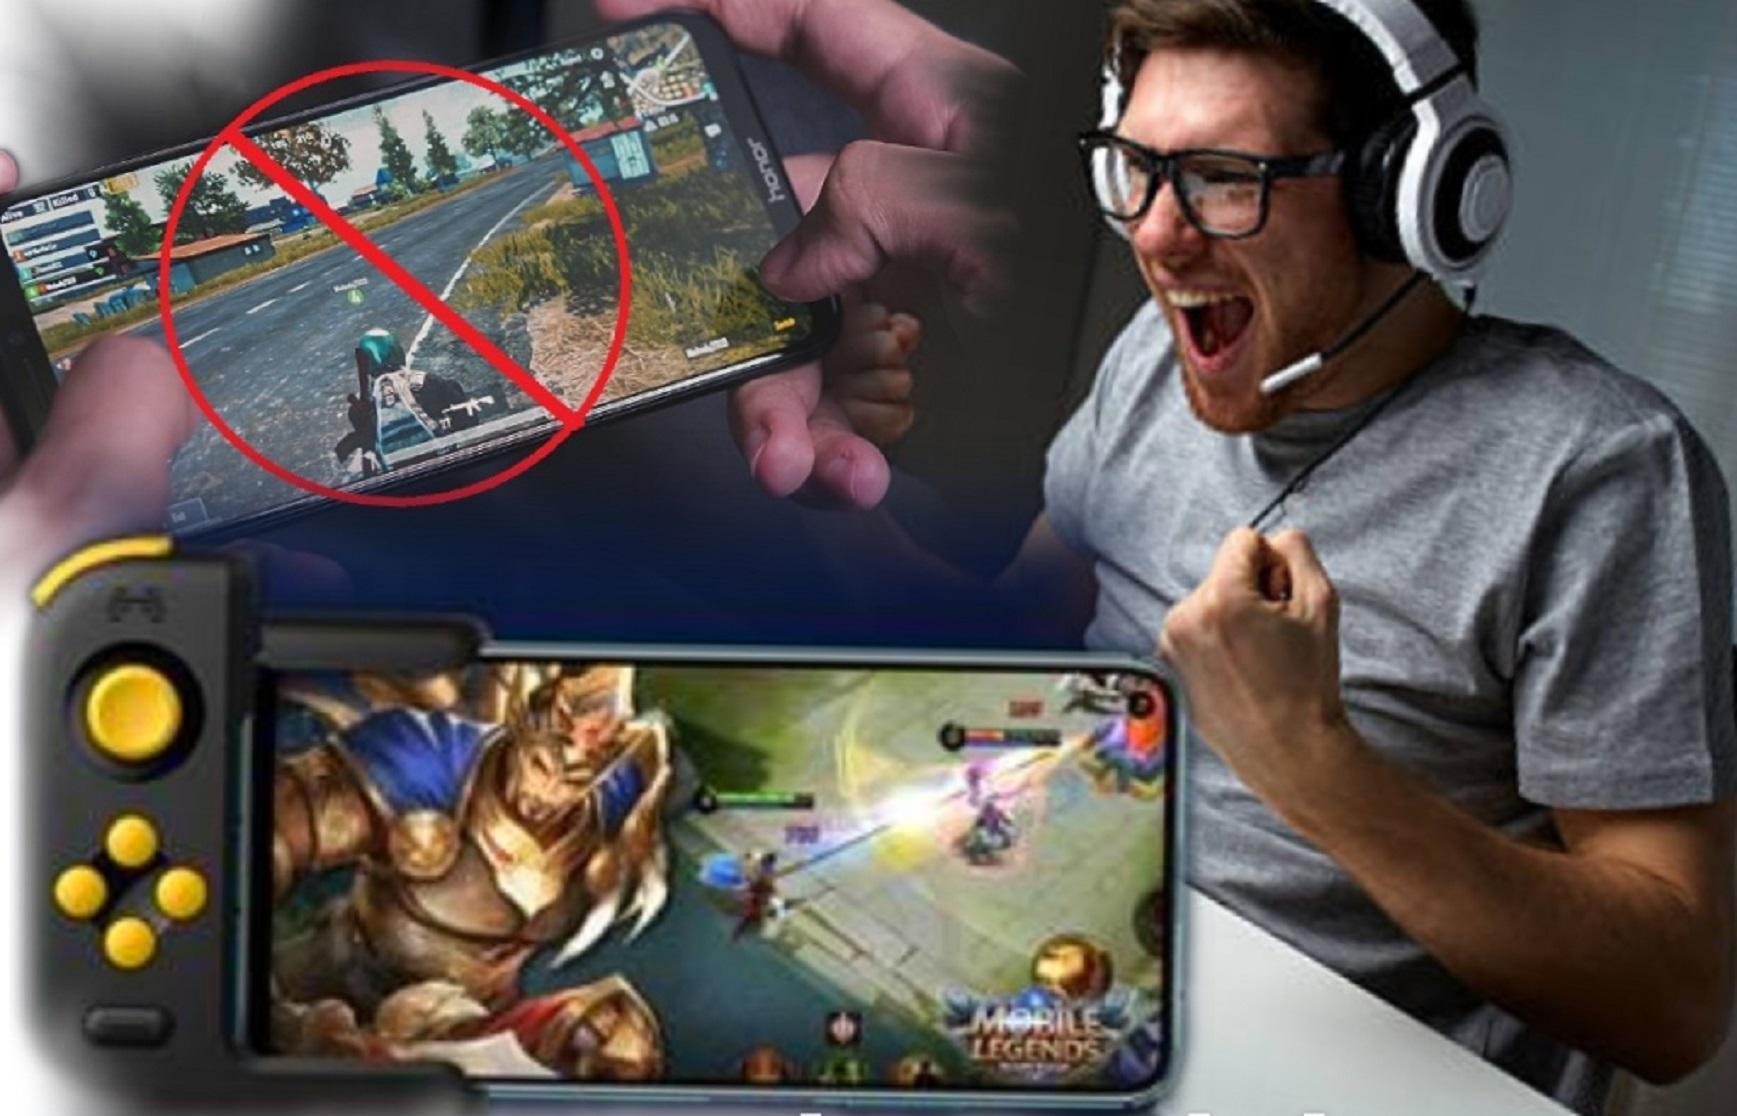 Honor представил кнопочный геймпад для смартфонов Honor GamePad